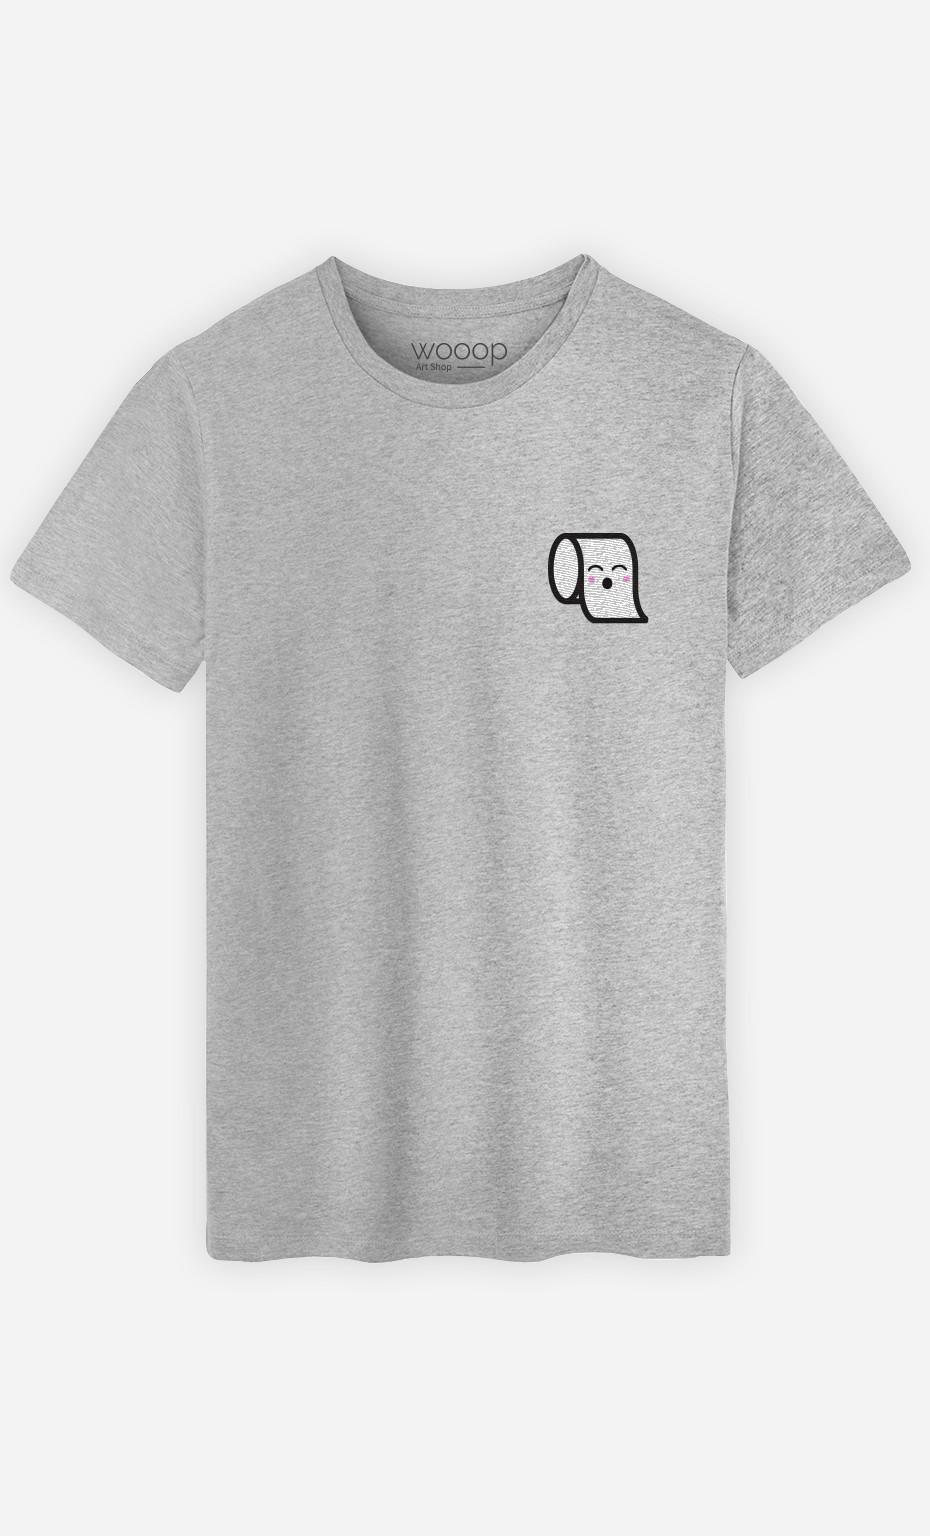 T-Shirt Homme Paper Fever - Brodé